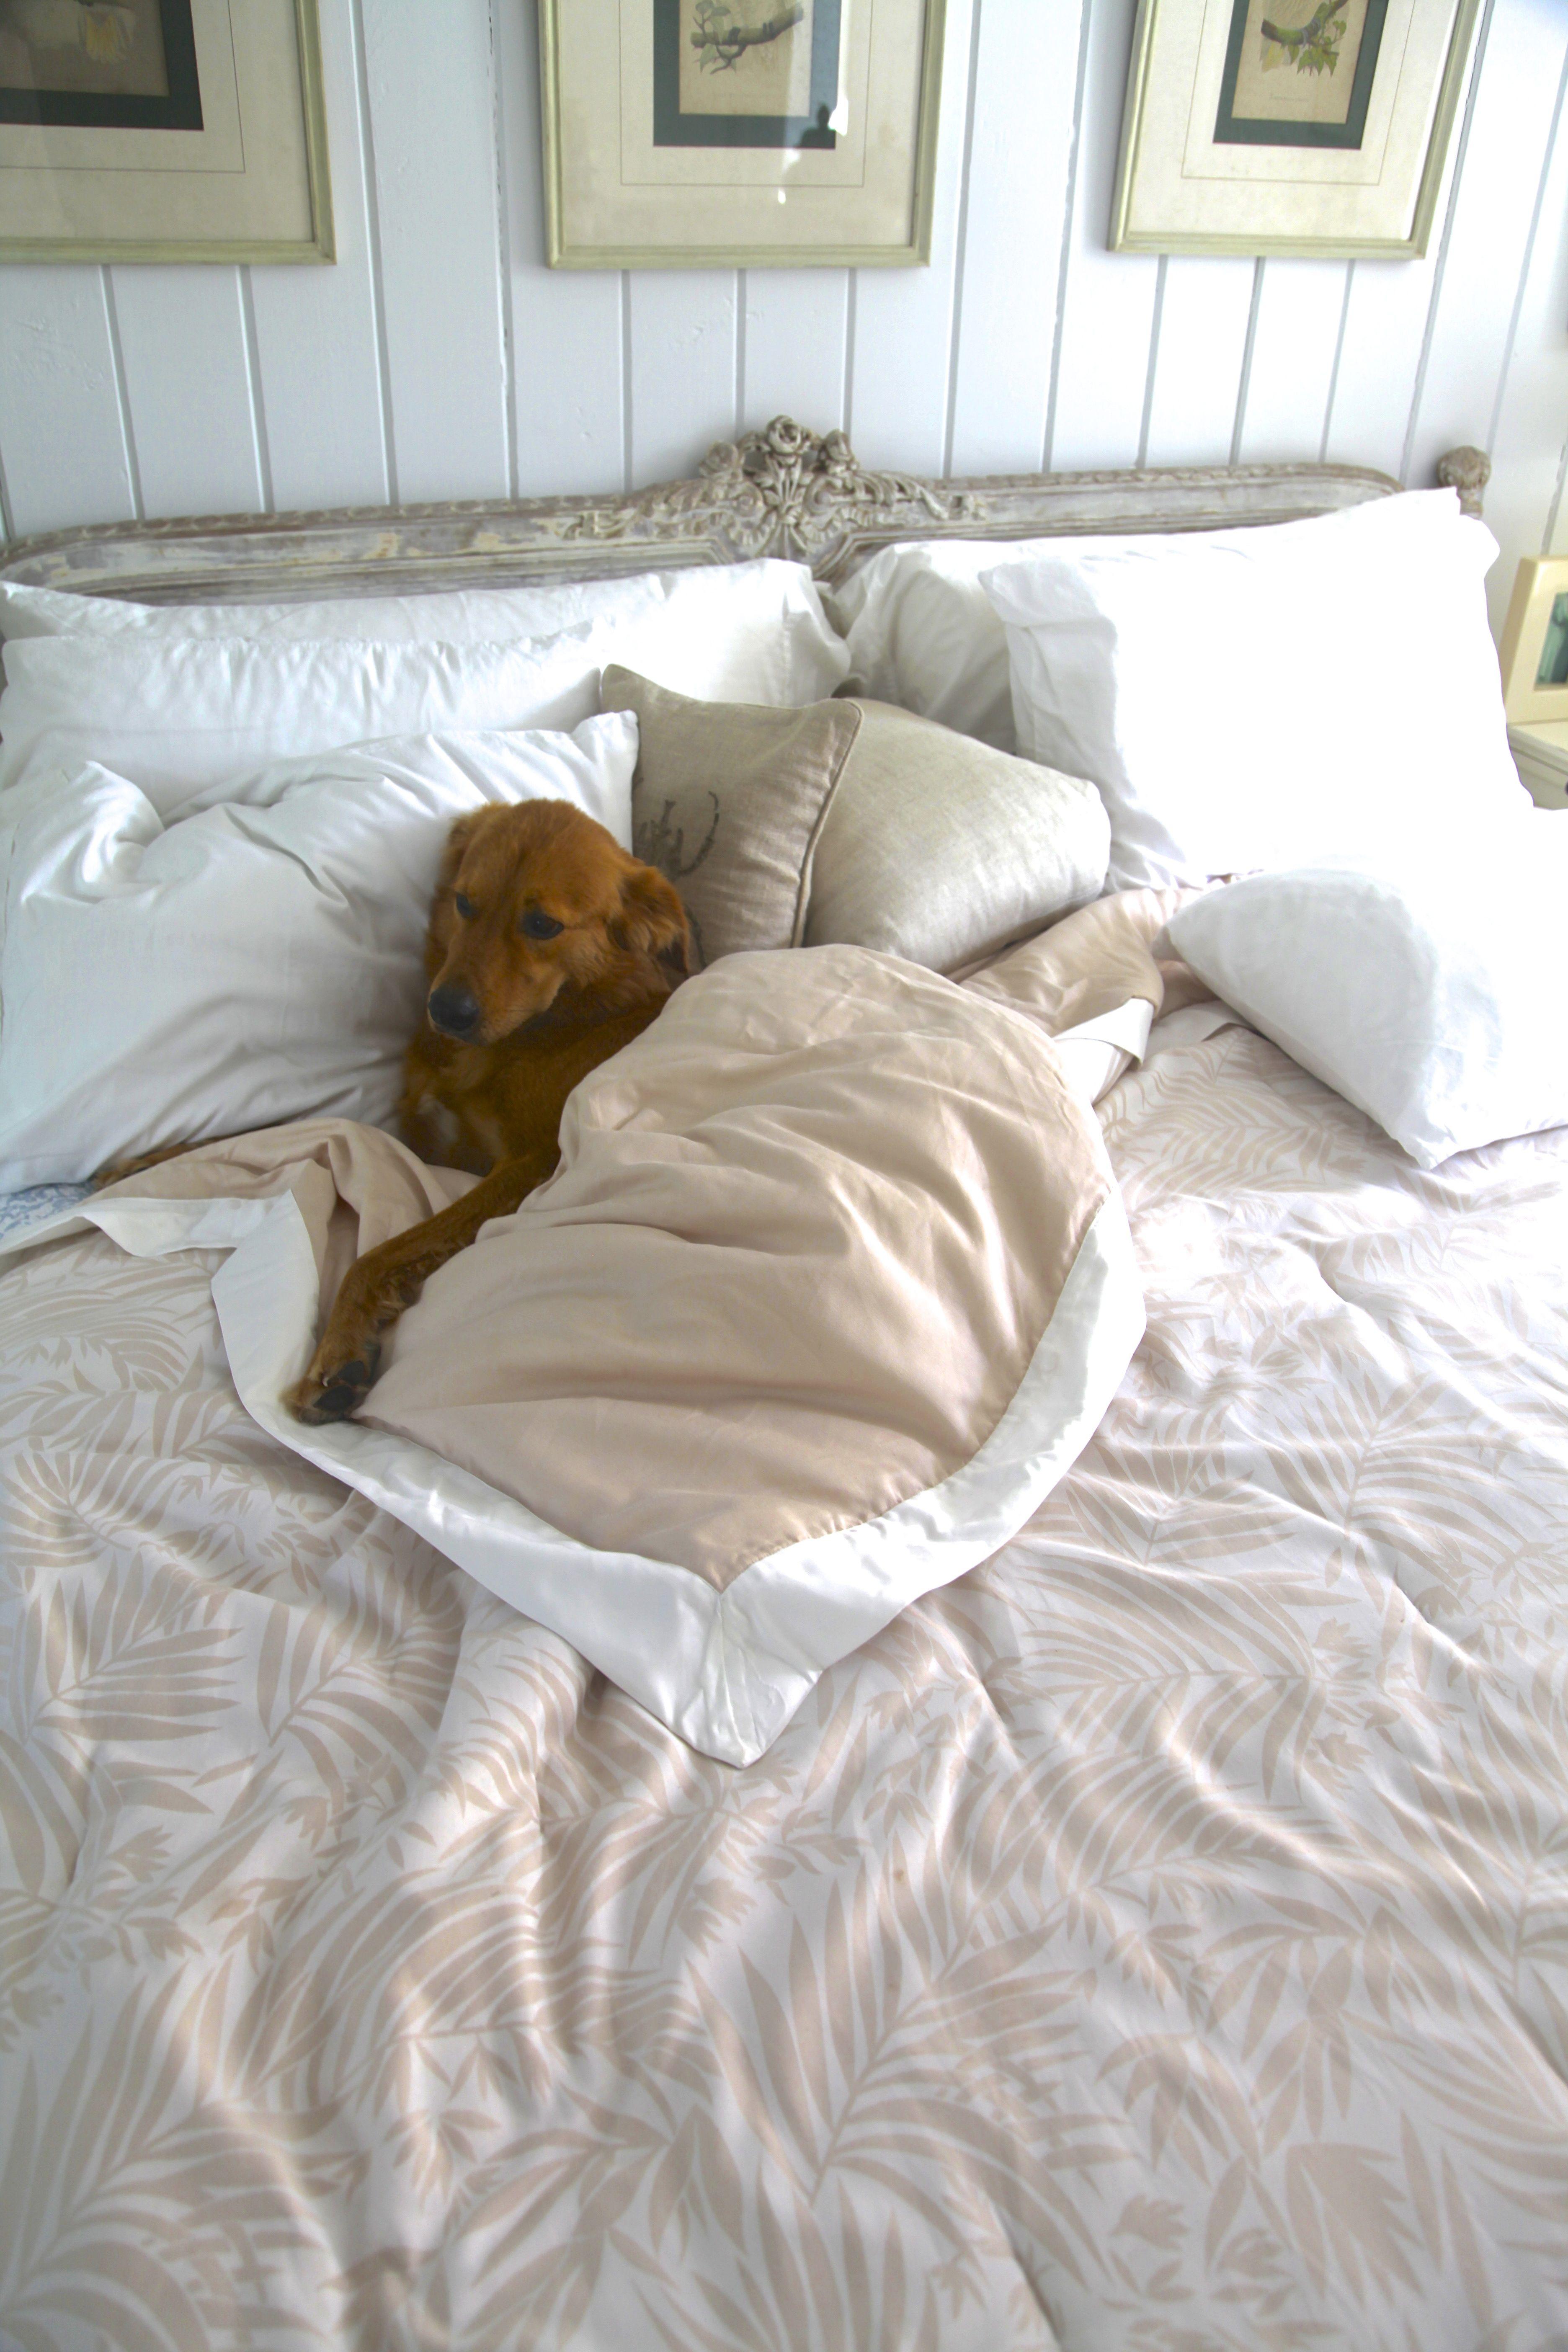 how to keep dogs warm sleeping outside